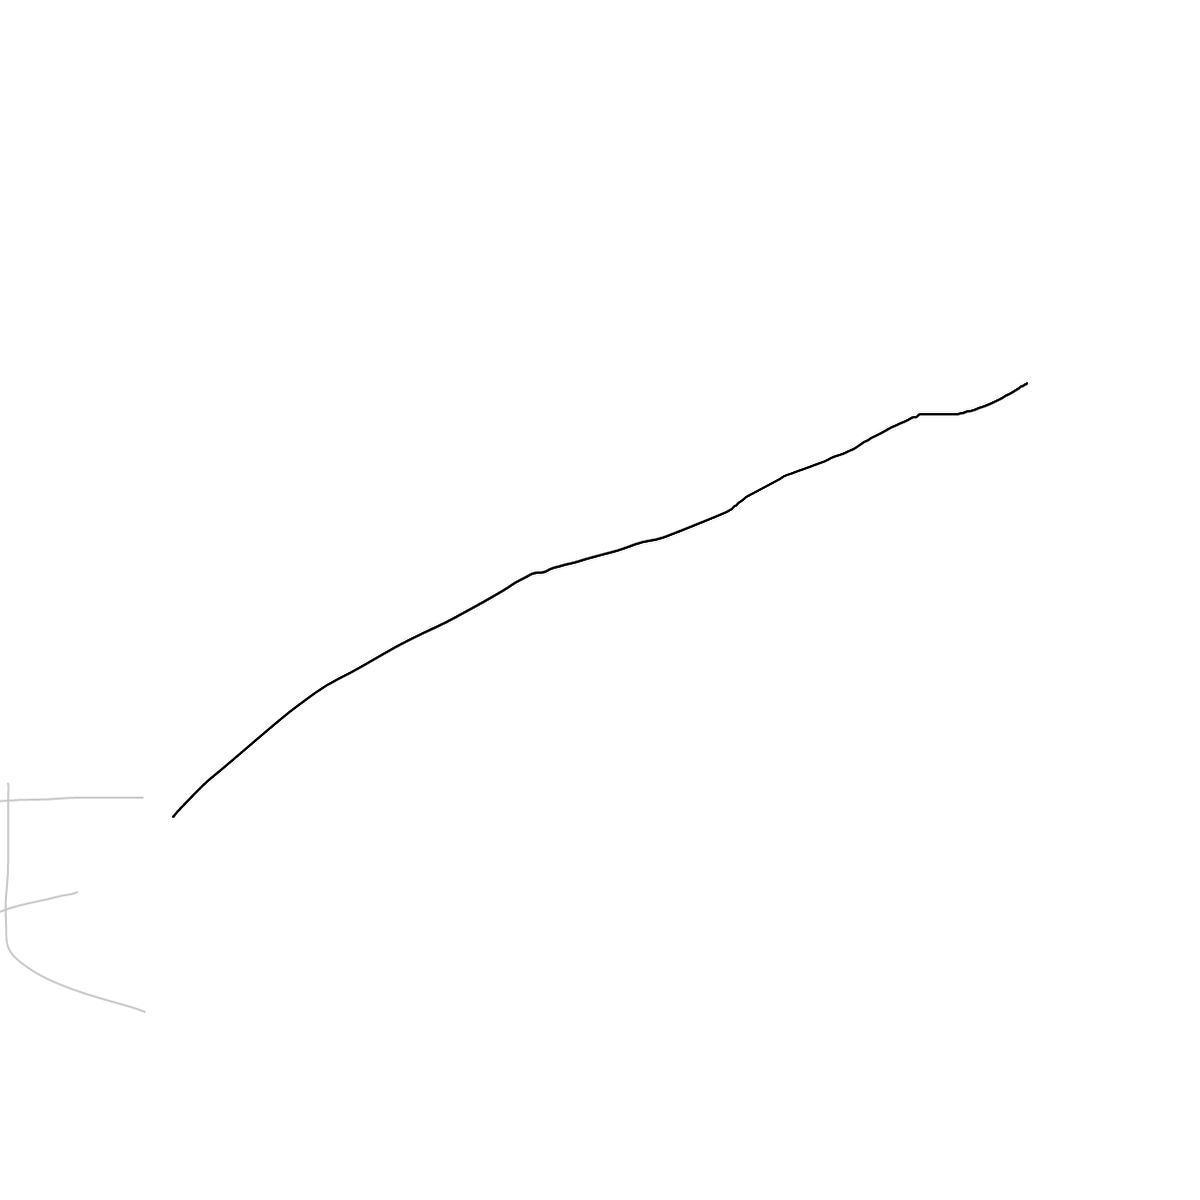 BAAAM drawing#22961 lat:40.5927314758300800lng: -73.9583587646484400